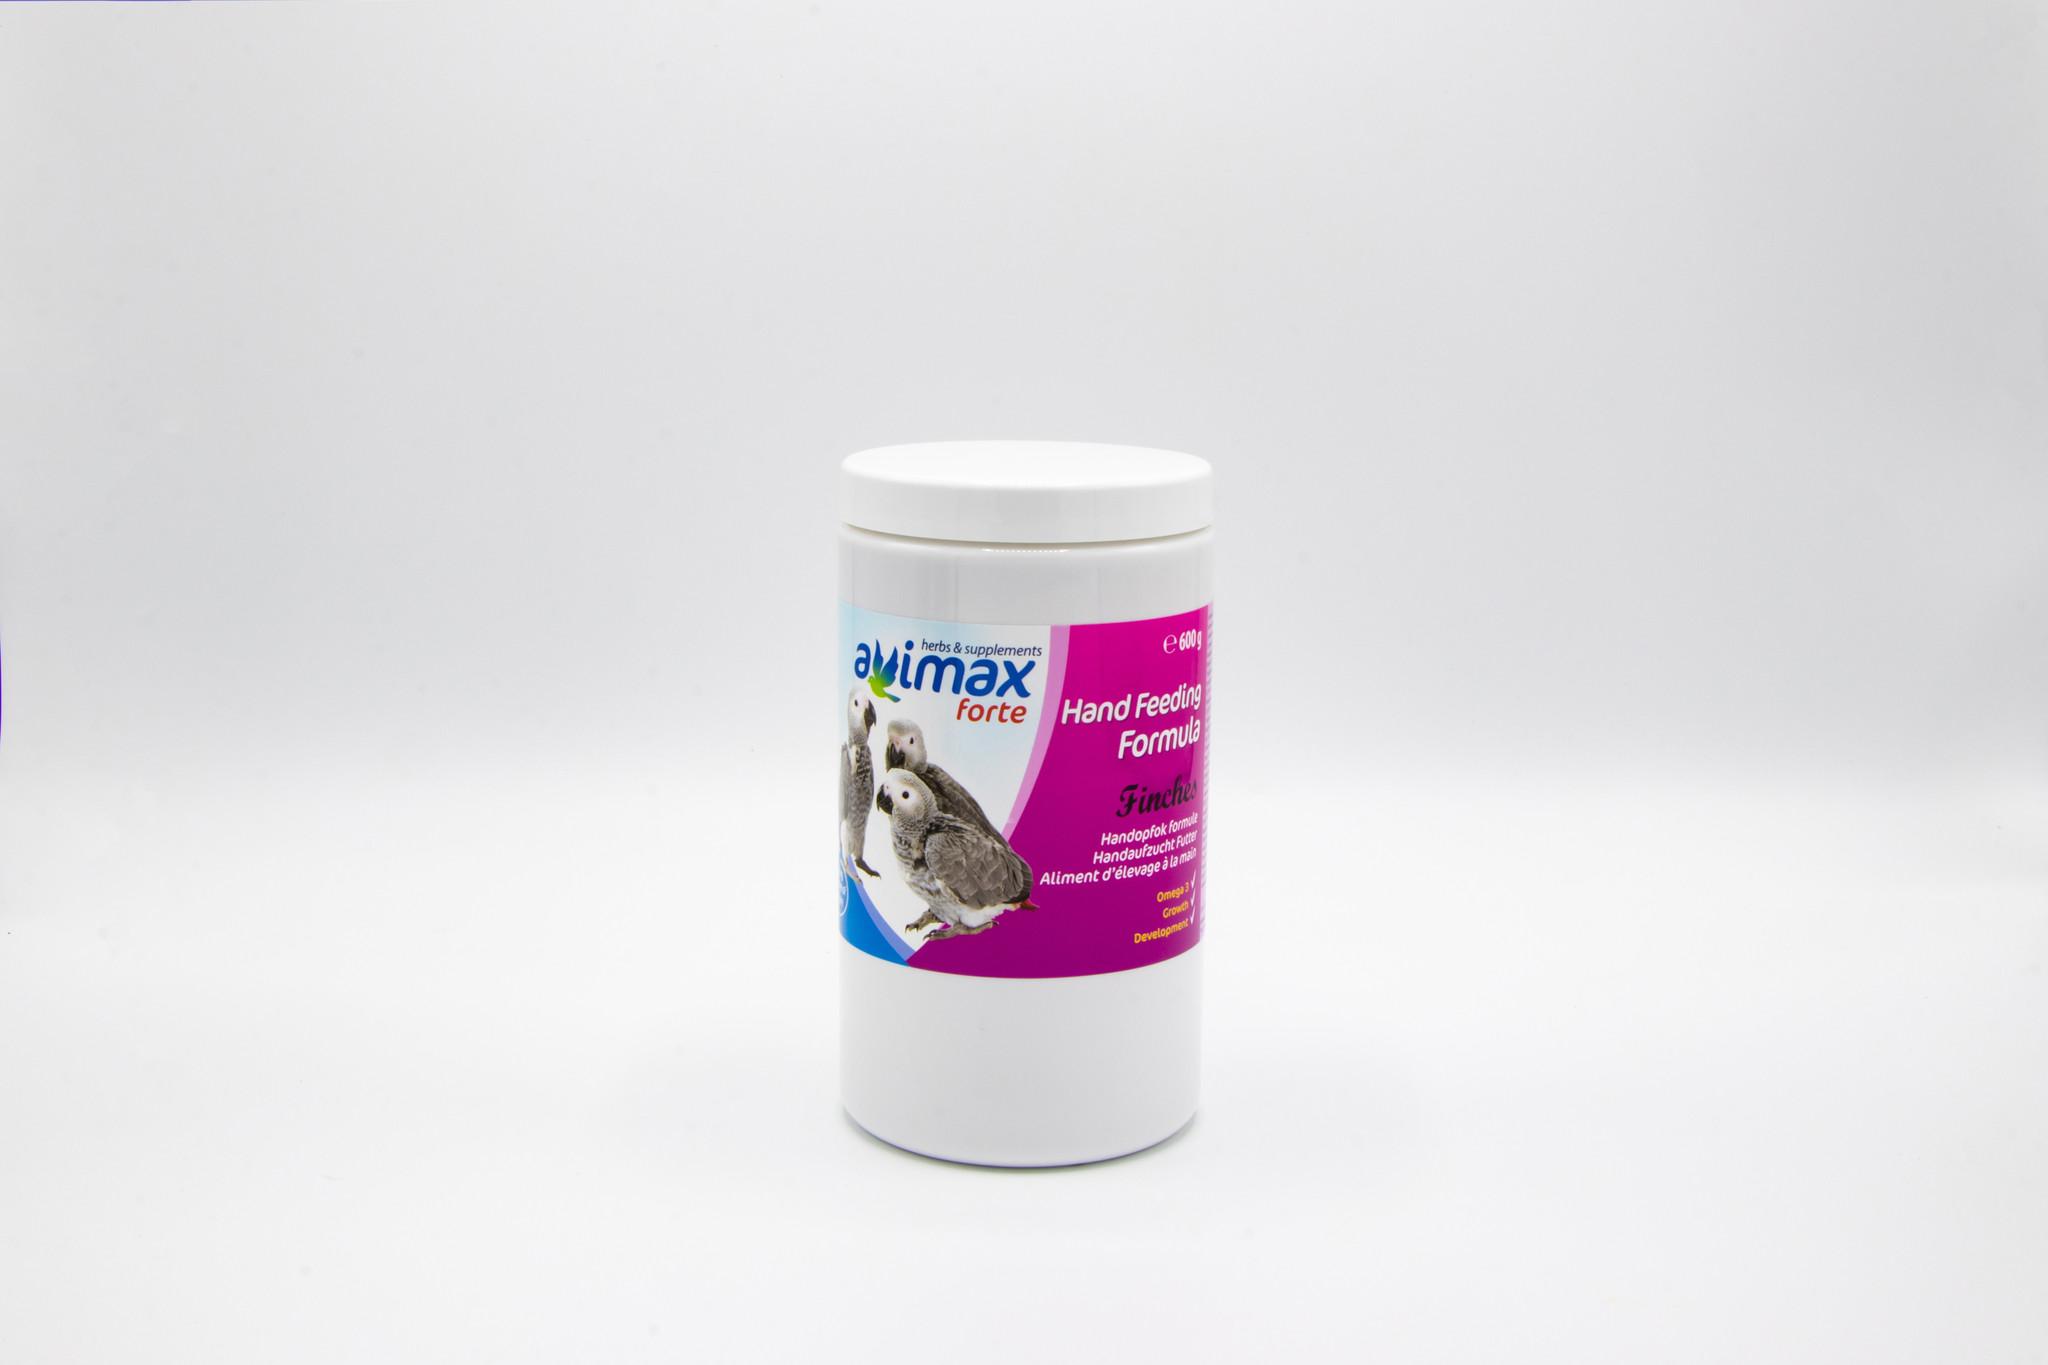 AviMax Forte AviMax Forte Hand Feeding Formula Finches